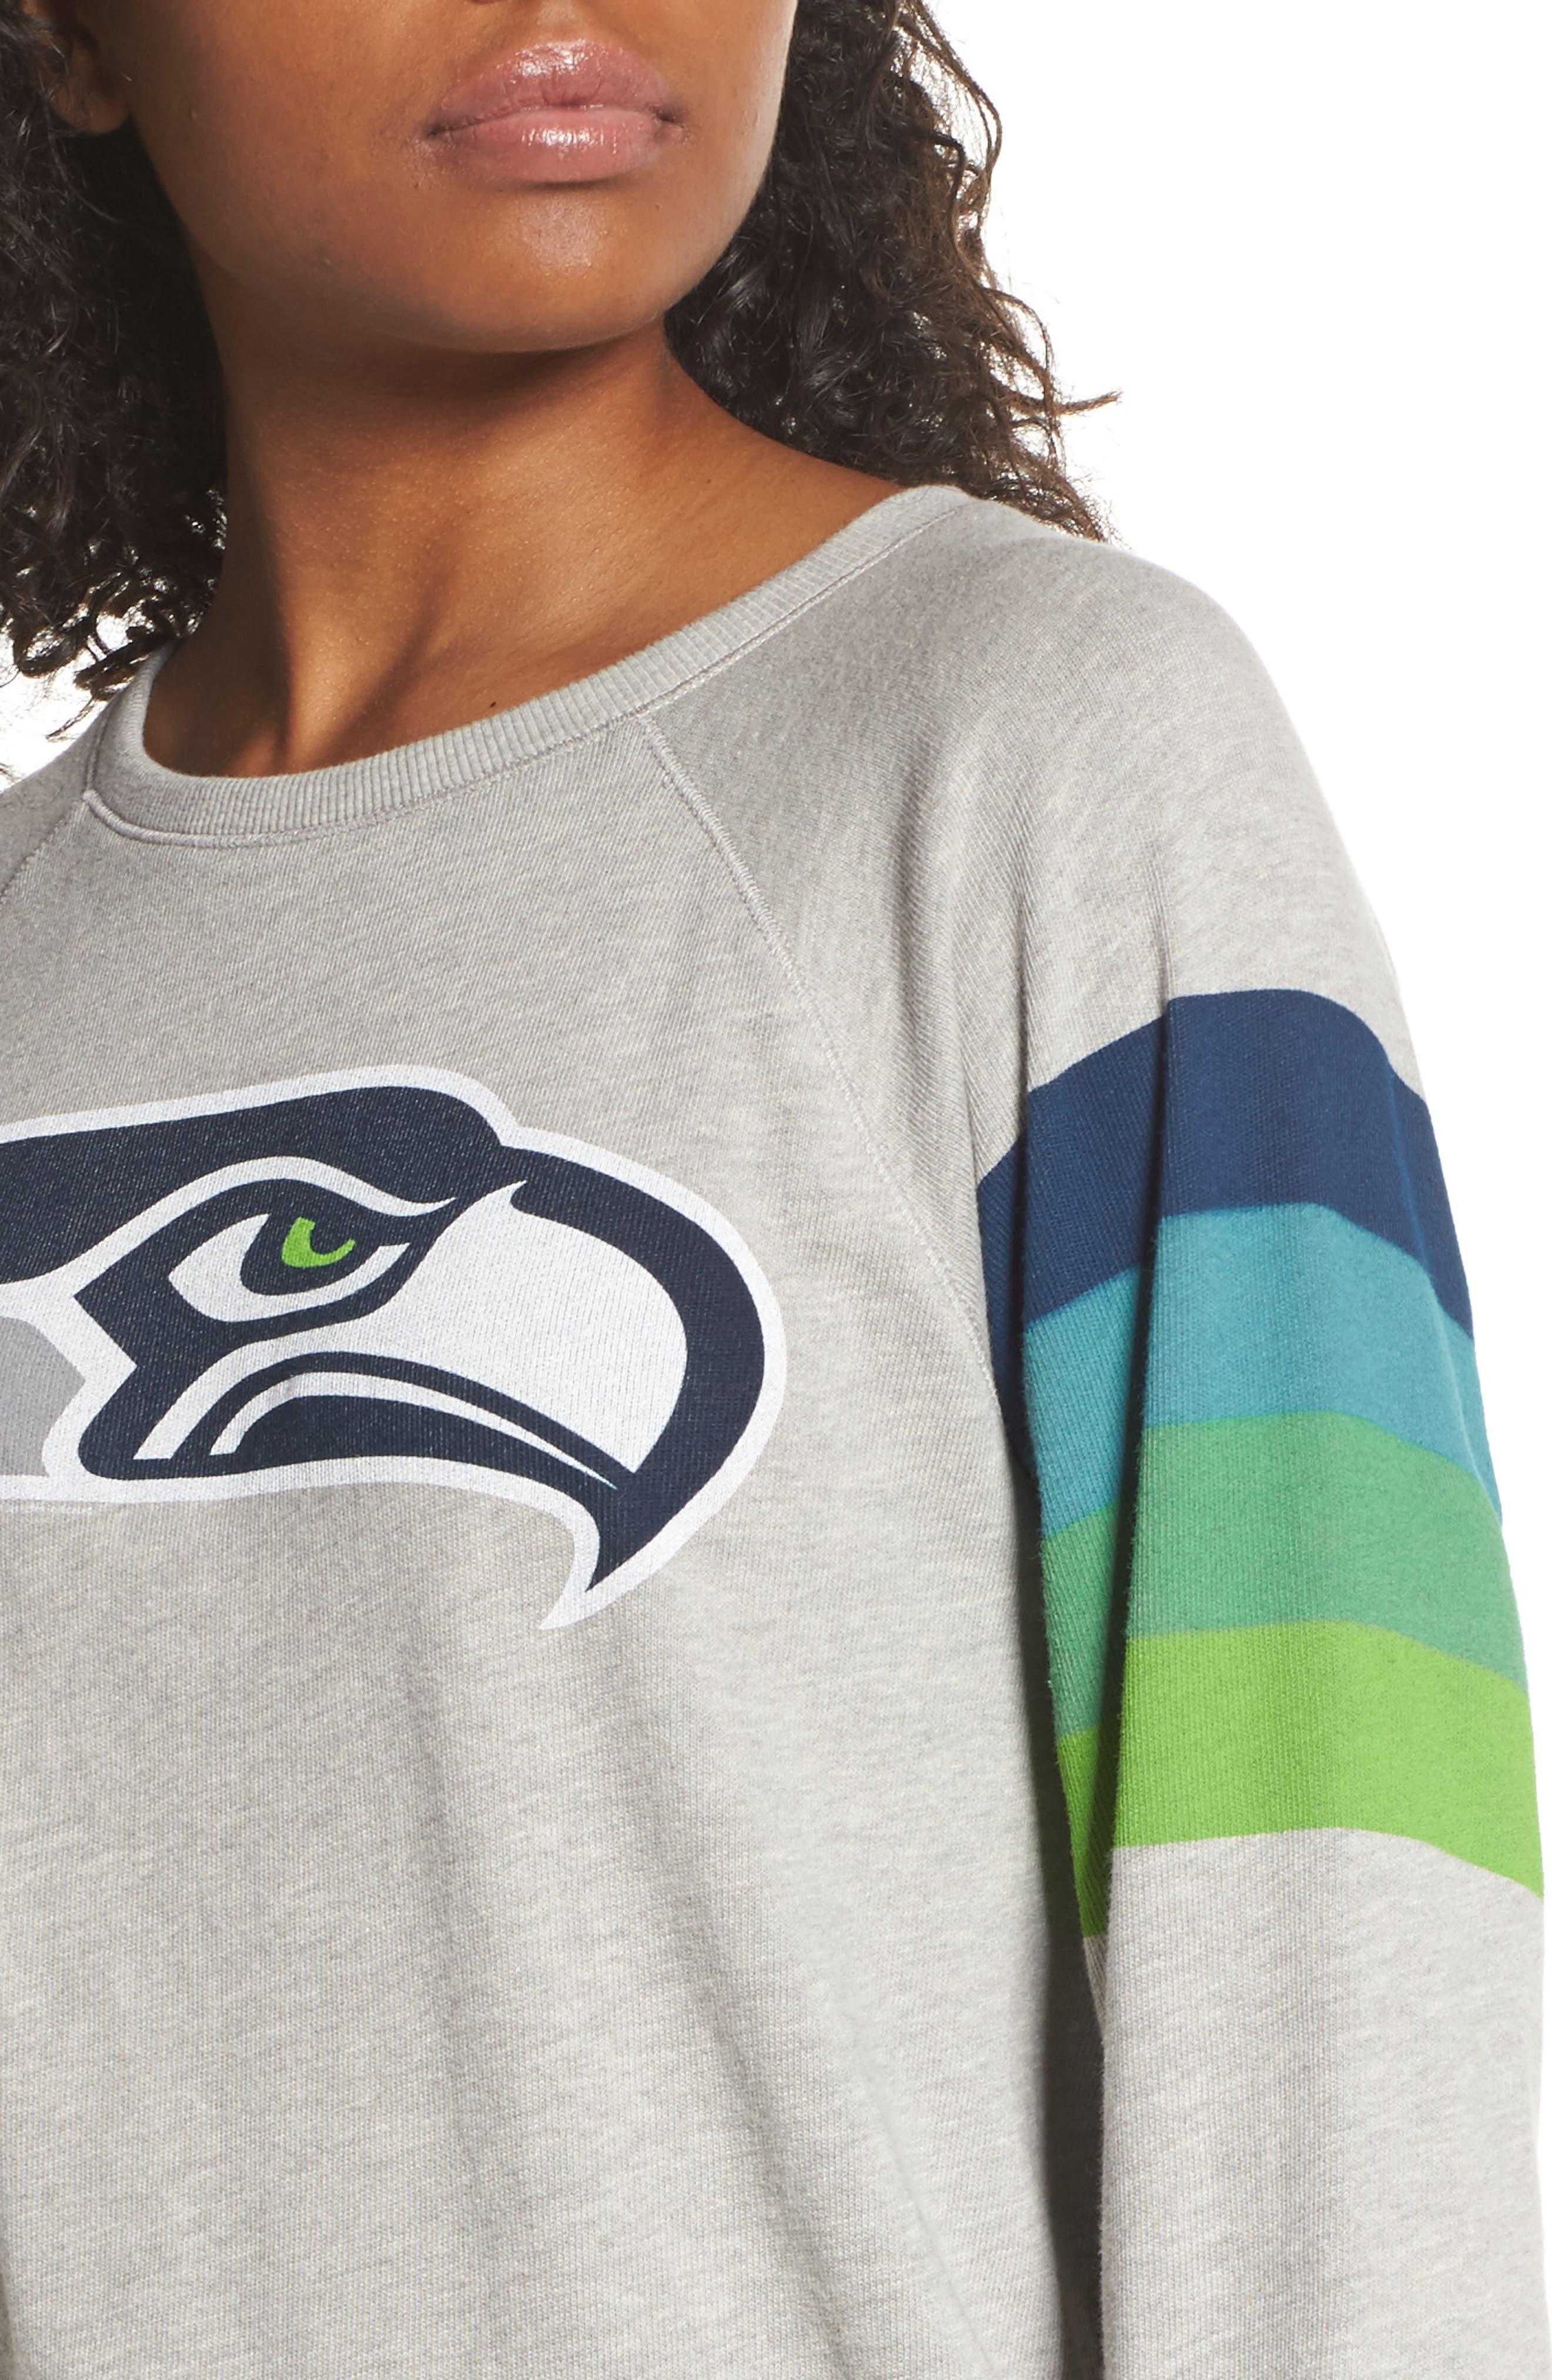 NFL Seattle Seahawks Hacci Sweatshirt,                             Alternate thumbnail 4, color,                             Dove Heather Grey